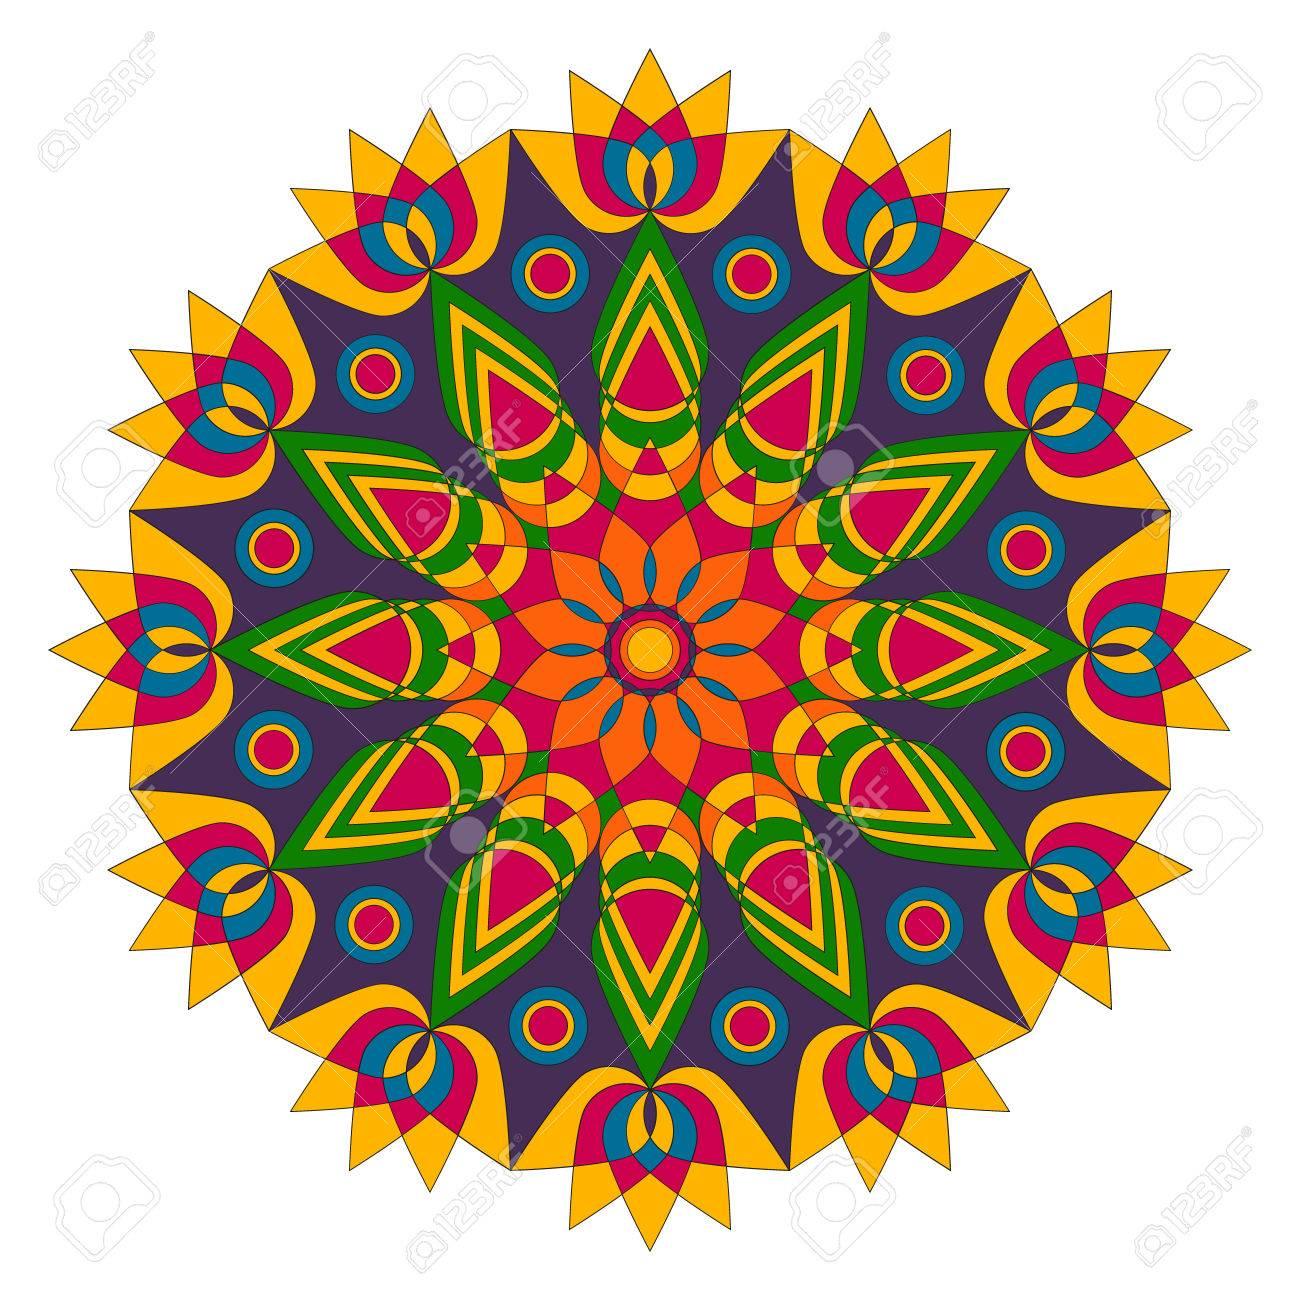 Colored Round Geometric Mandala Lotus Flower Shape Adult Coloring